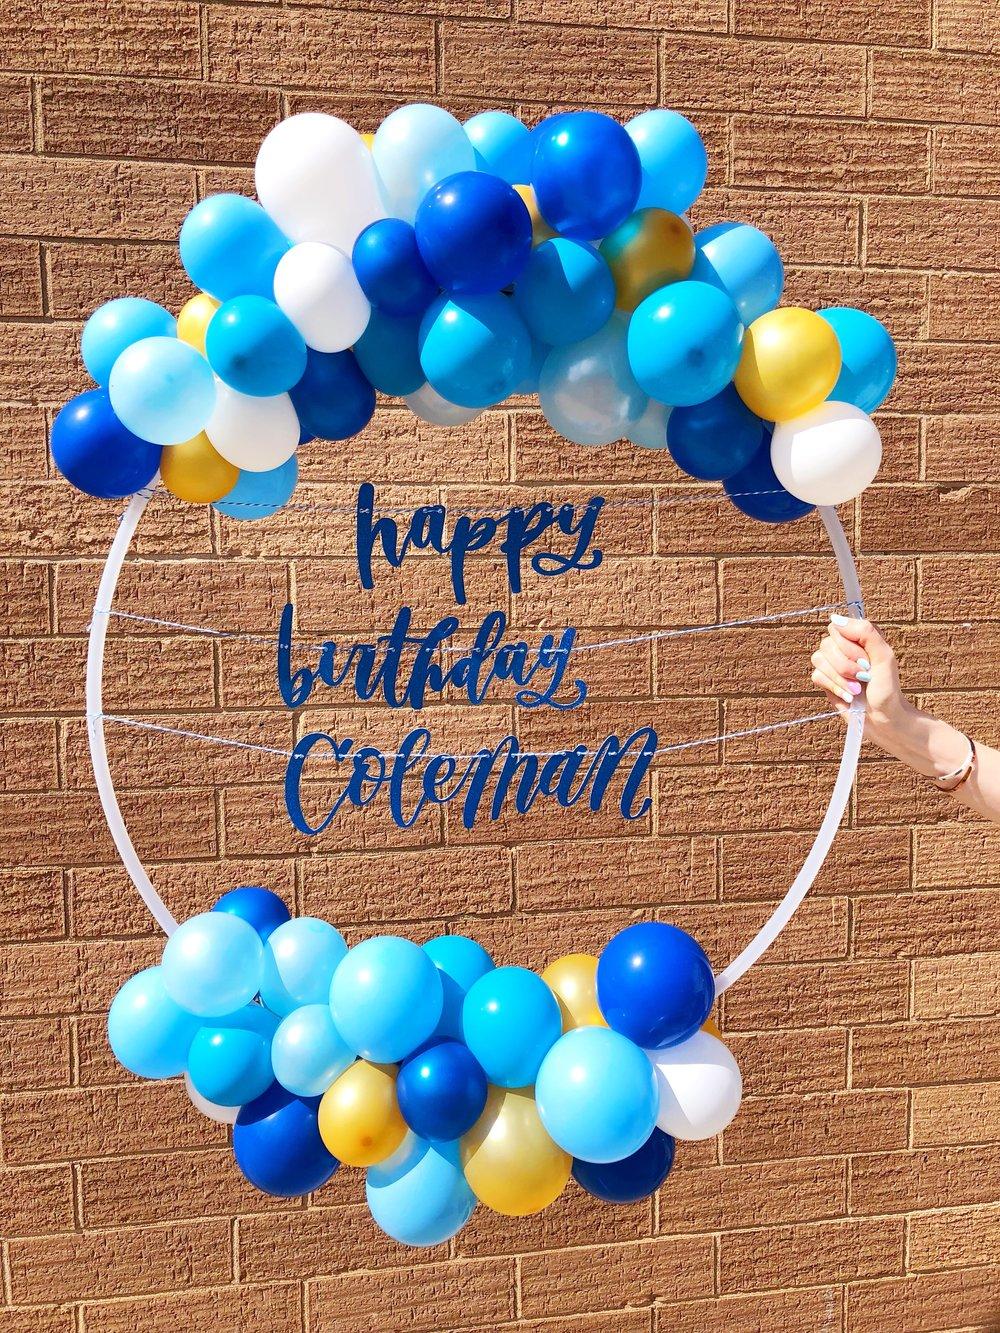 vroom_vroom_balloon_wreath_happy_birthday_blue_gold.JPG